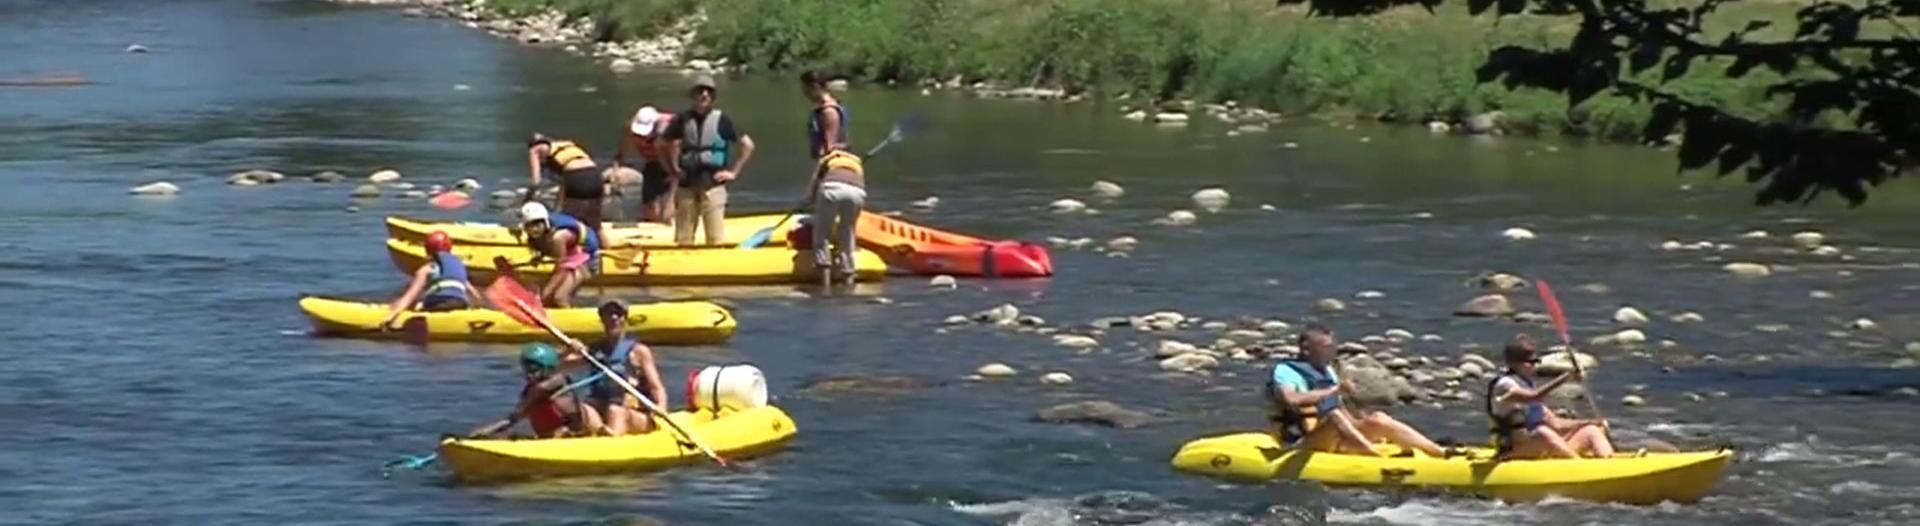 slider-camping-mijeannes-ariege-canoe-isere